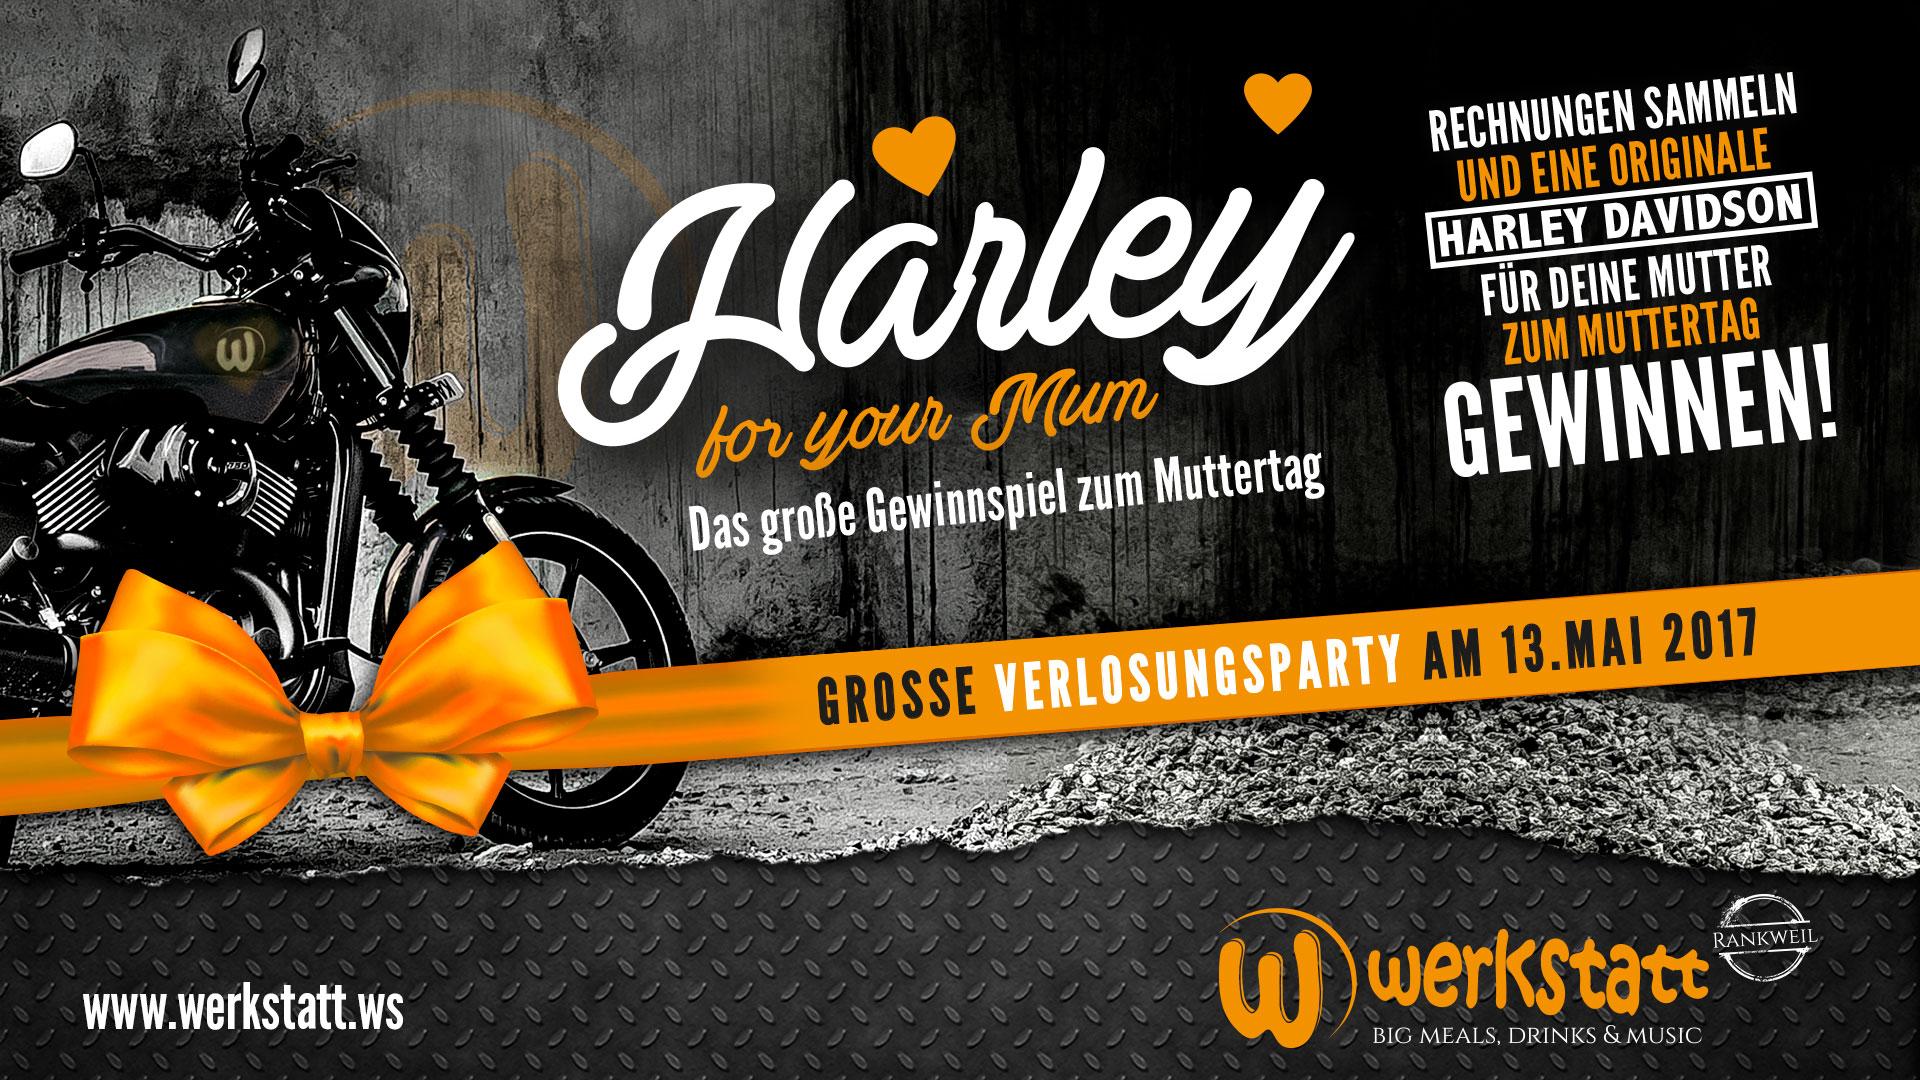 VideoScreen-HarleyVerlosung-1920x1080-WSRW